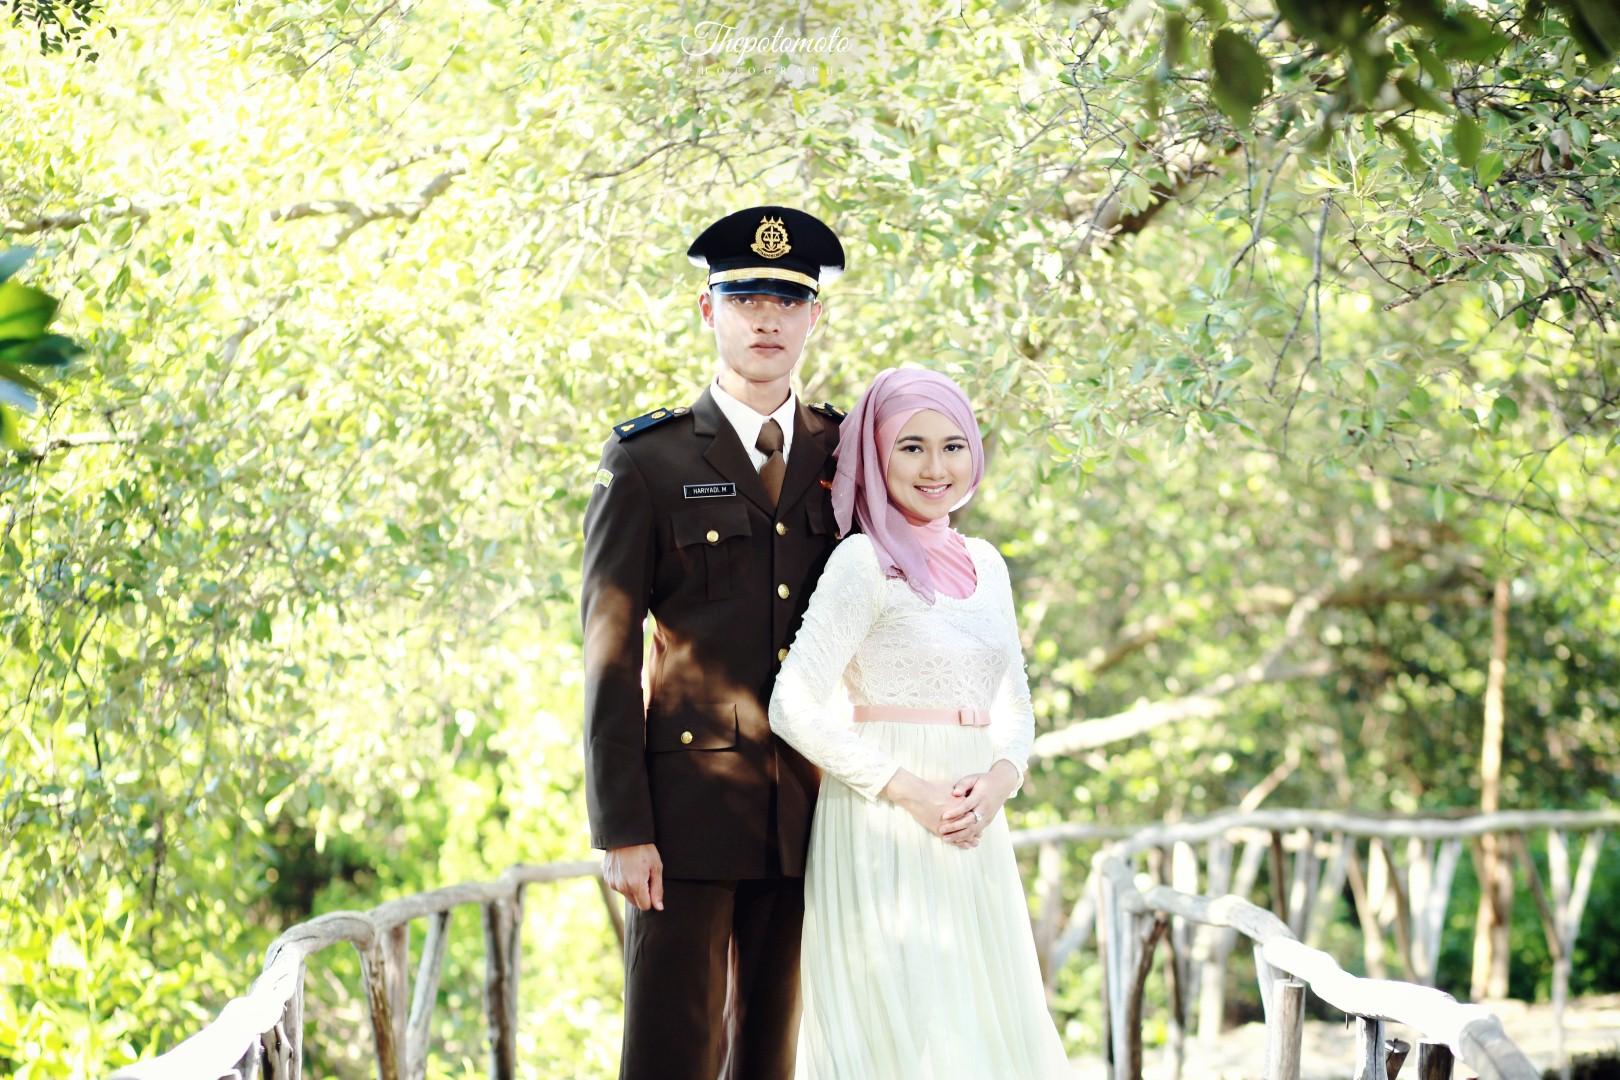 Ide Konsep Foto Islami Untuk Foto Prewedding Hijab